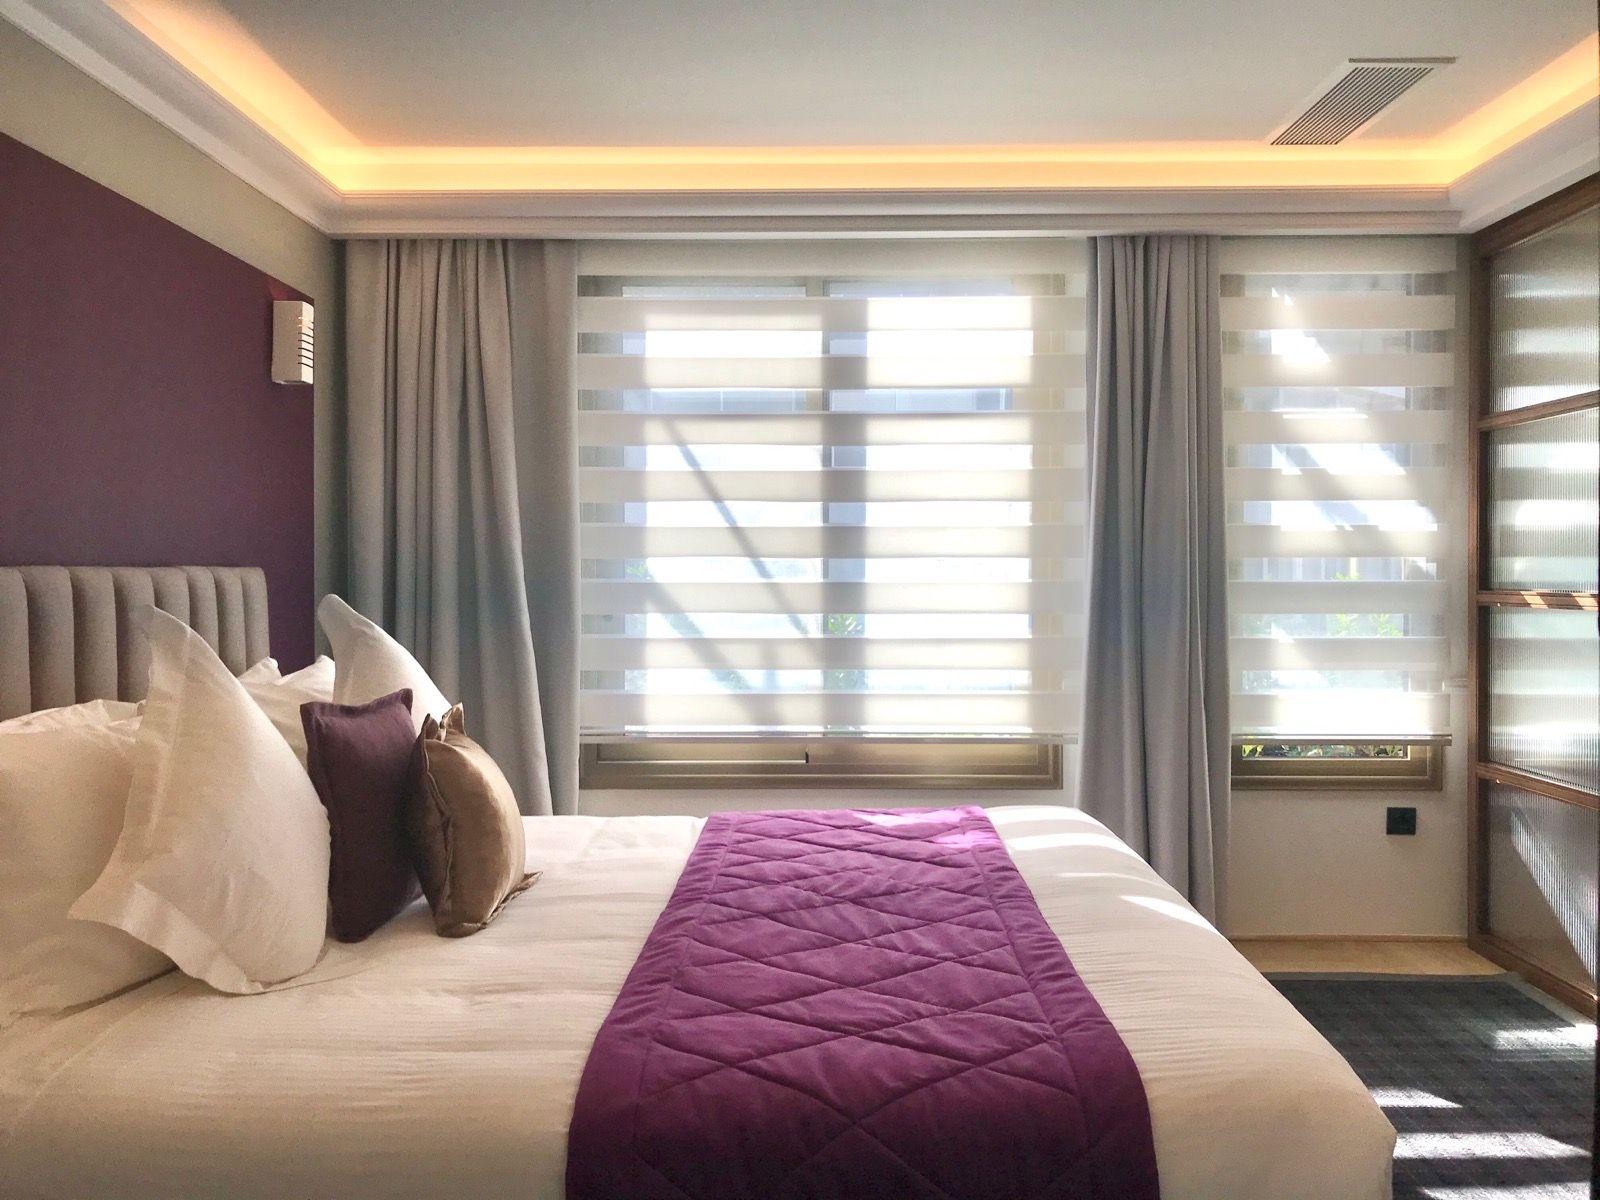 5* The Excelsior Hotel Thessaloniki - Θεσσαλονίκη ? 2 Ημέρες (1 Διανυκτέρευση) ? 2 άτομα ? Πρωινό ? έως 31/05/2020 ? <strong>Μέλος του TOR HOTEL GROUP!</strong>